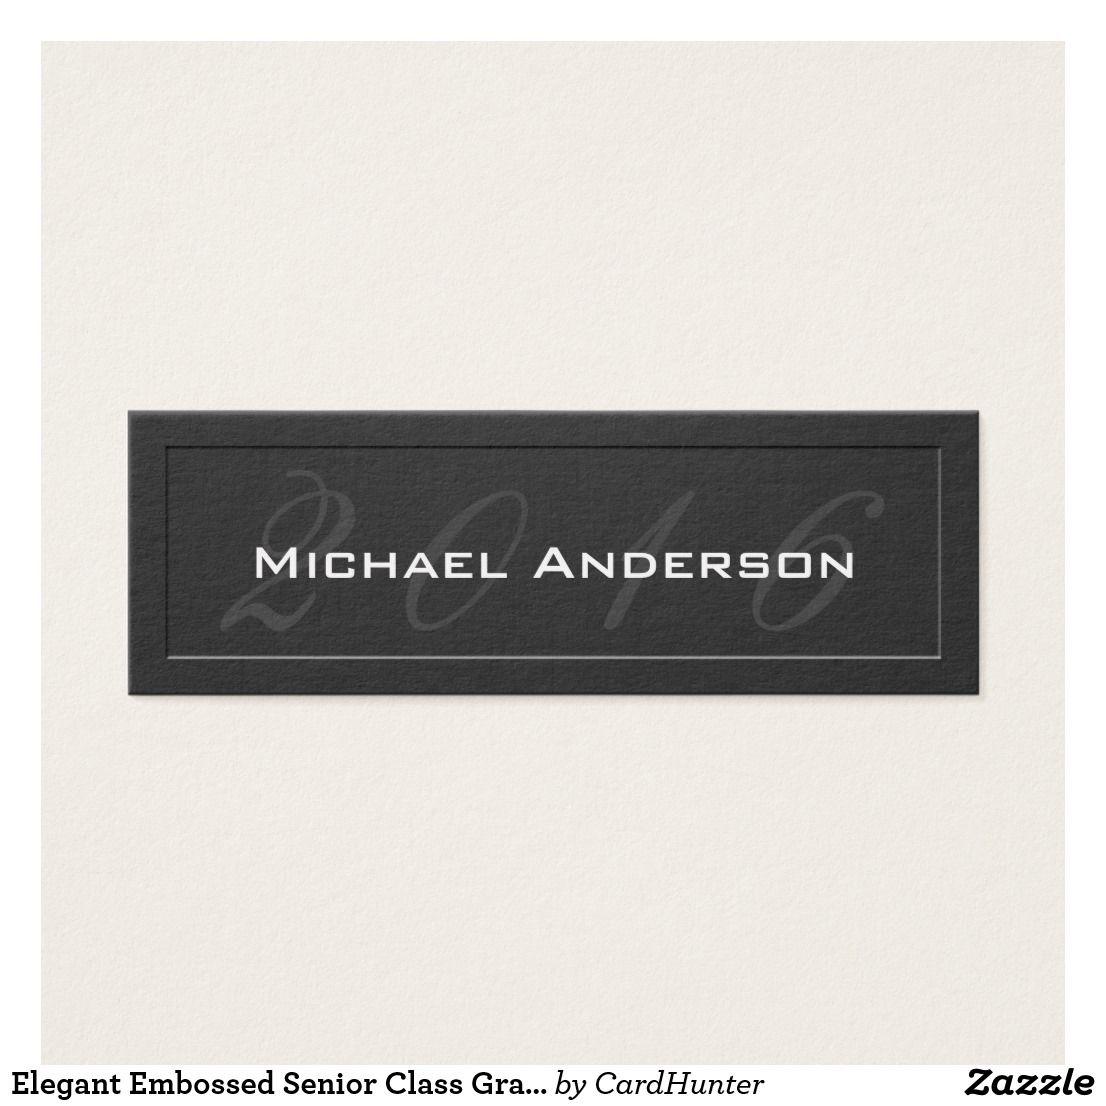 Elegant Embossed Senior Class Graduation Name Card   Business Cards ...